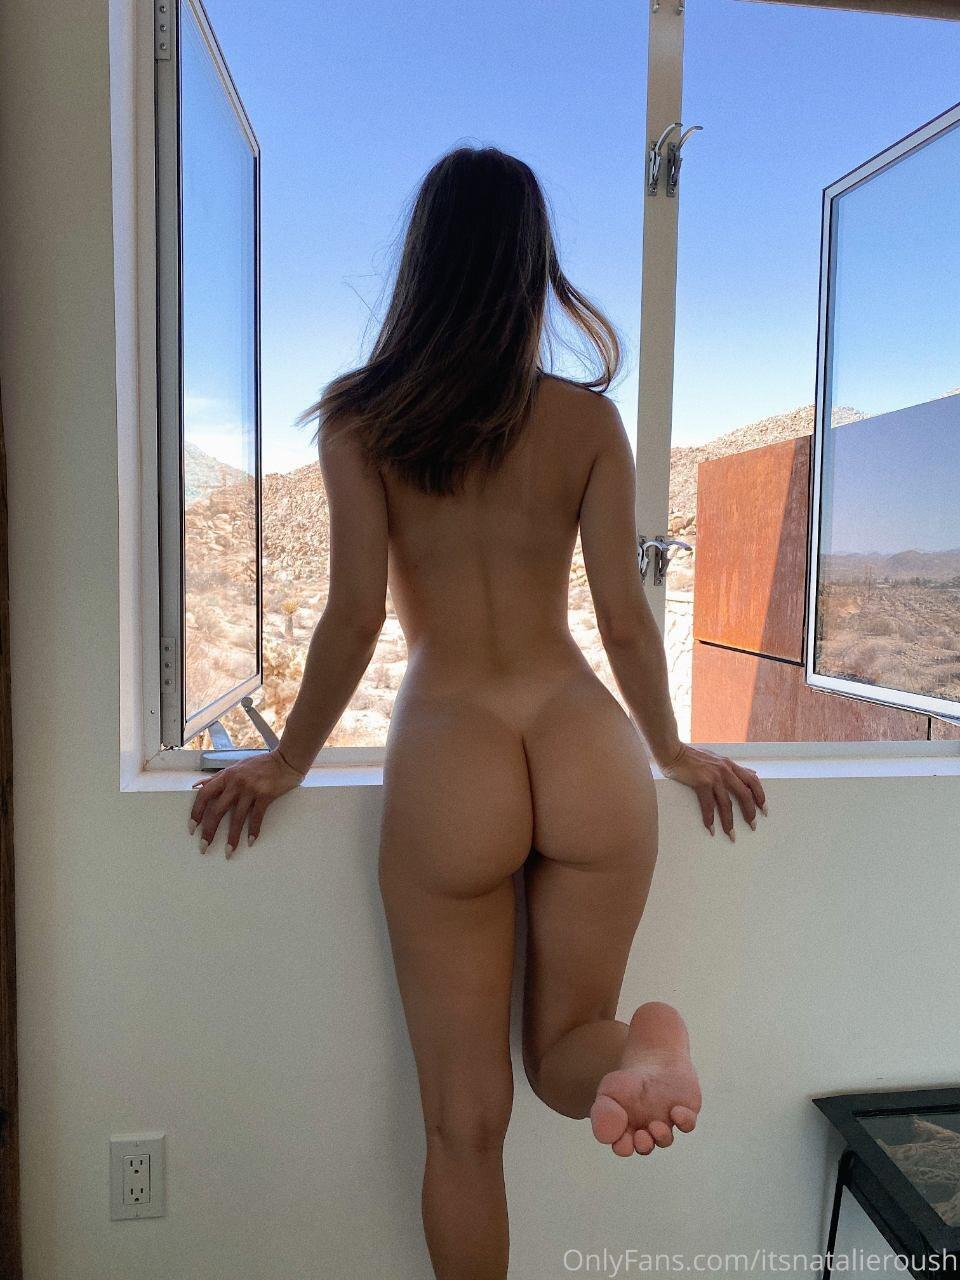 Itsnatalieroush, fotos packs onlyfans, chicas desnudas, culos bonitos